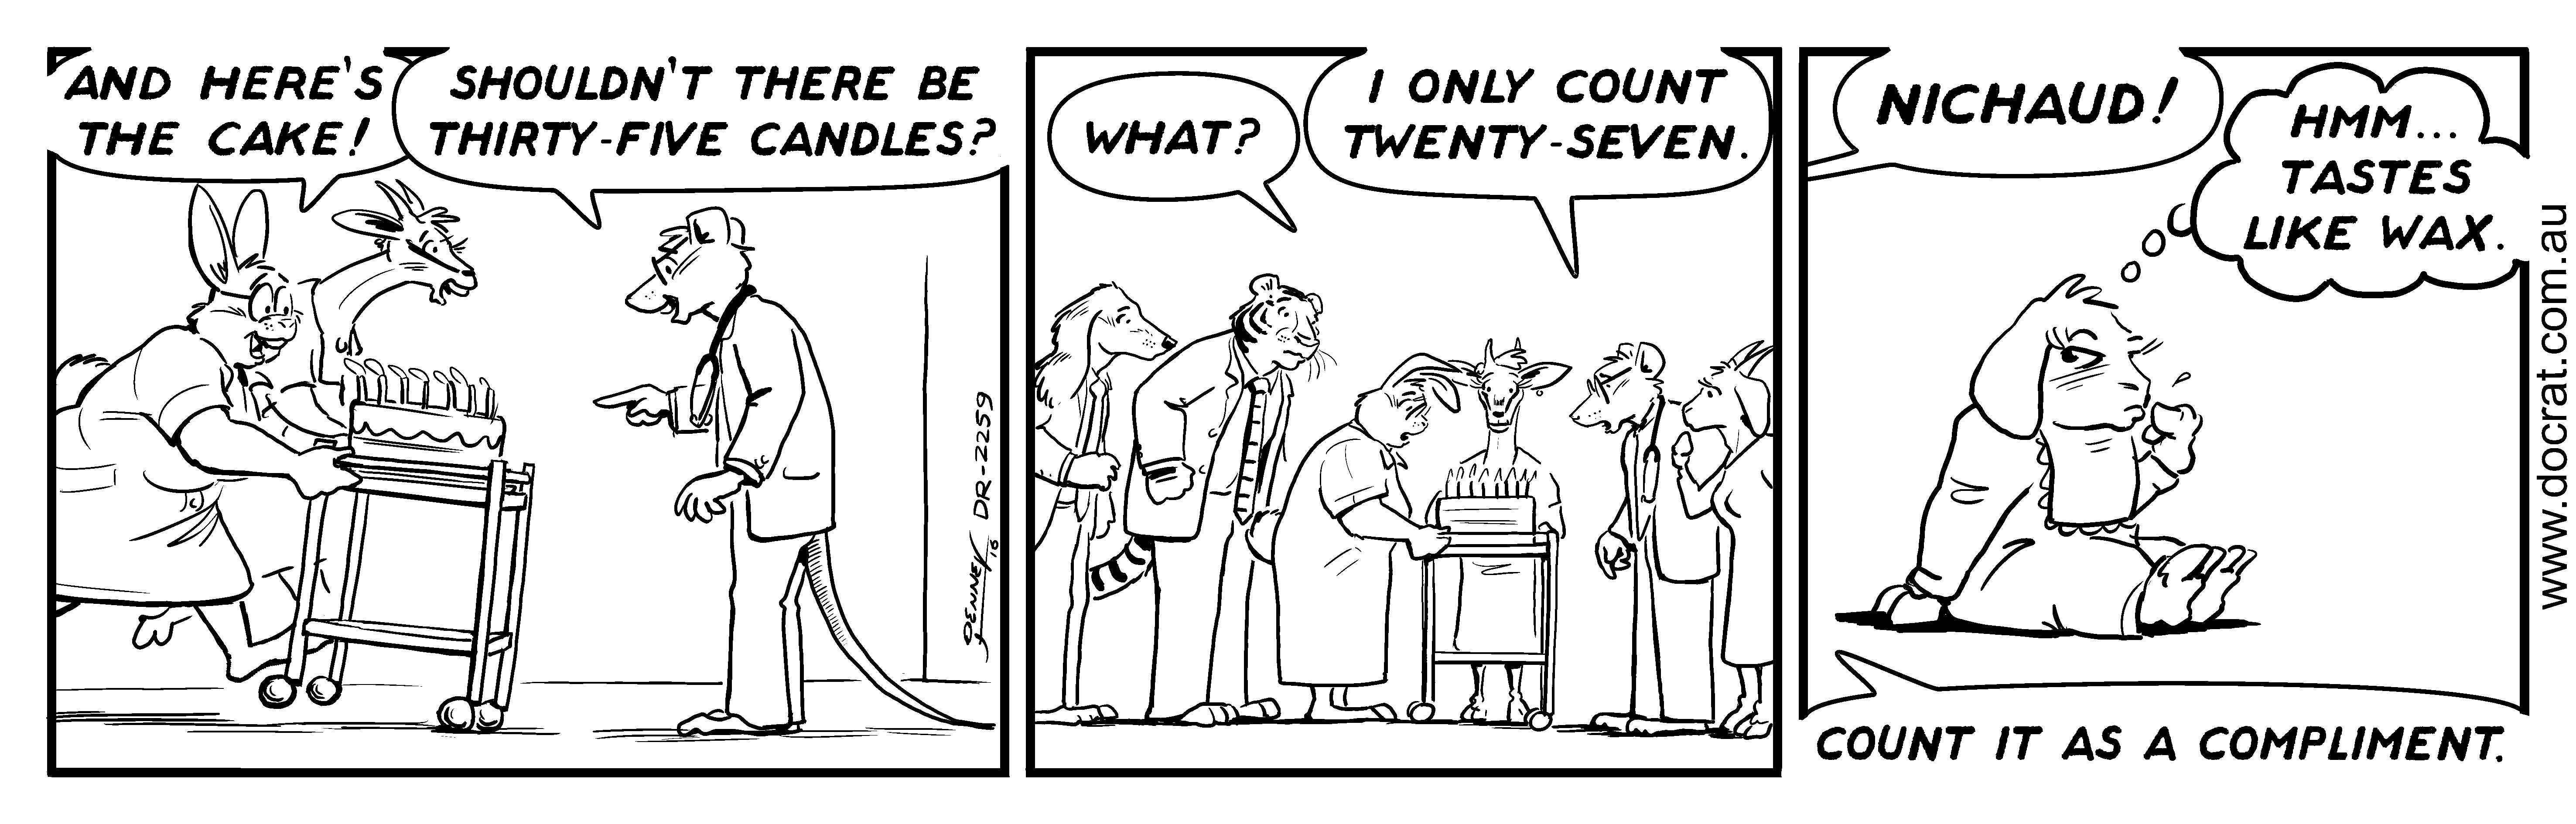 20160630